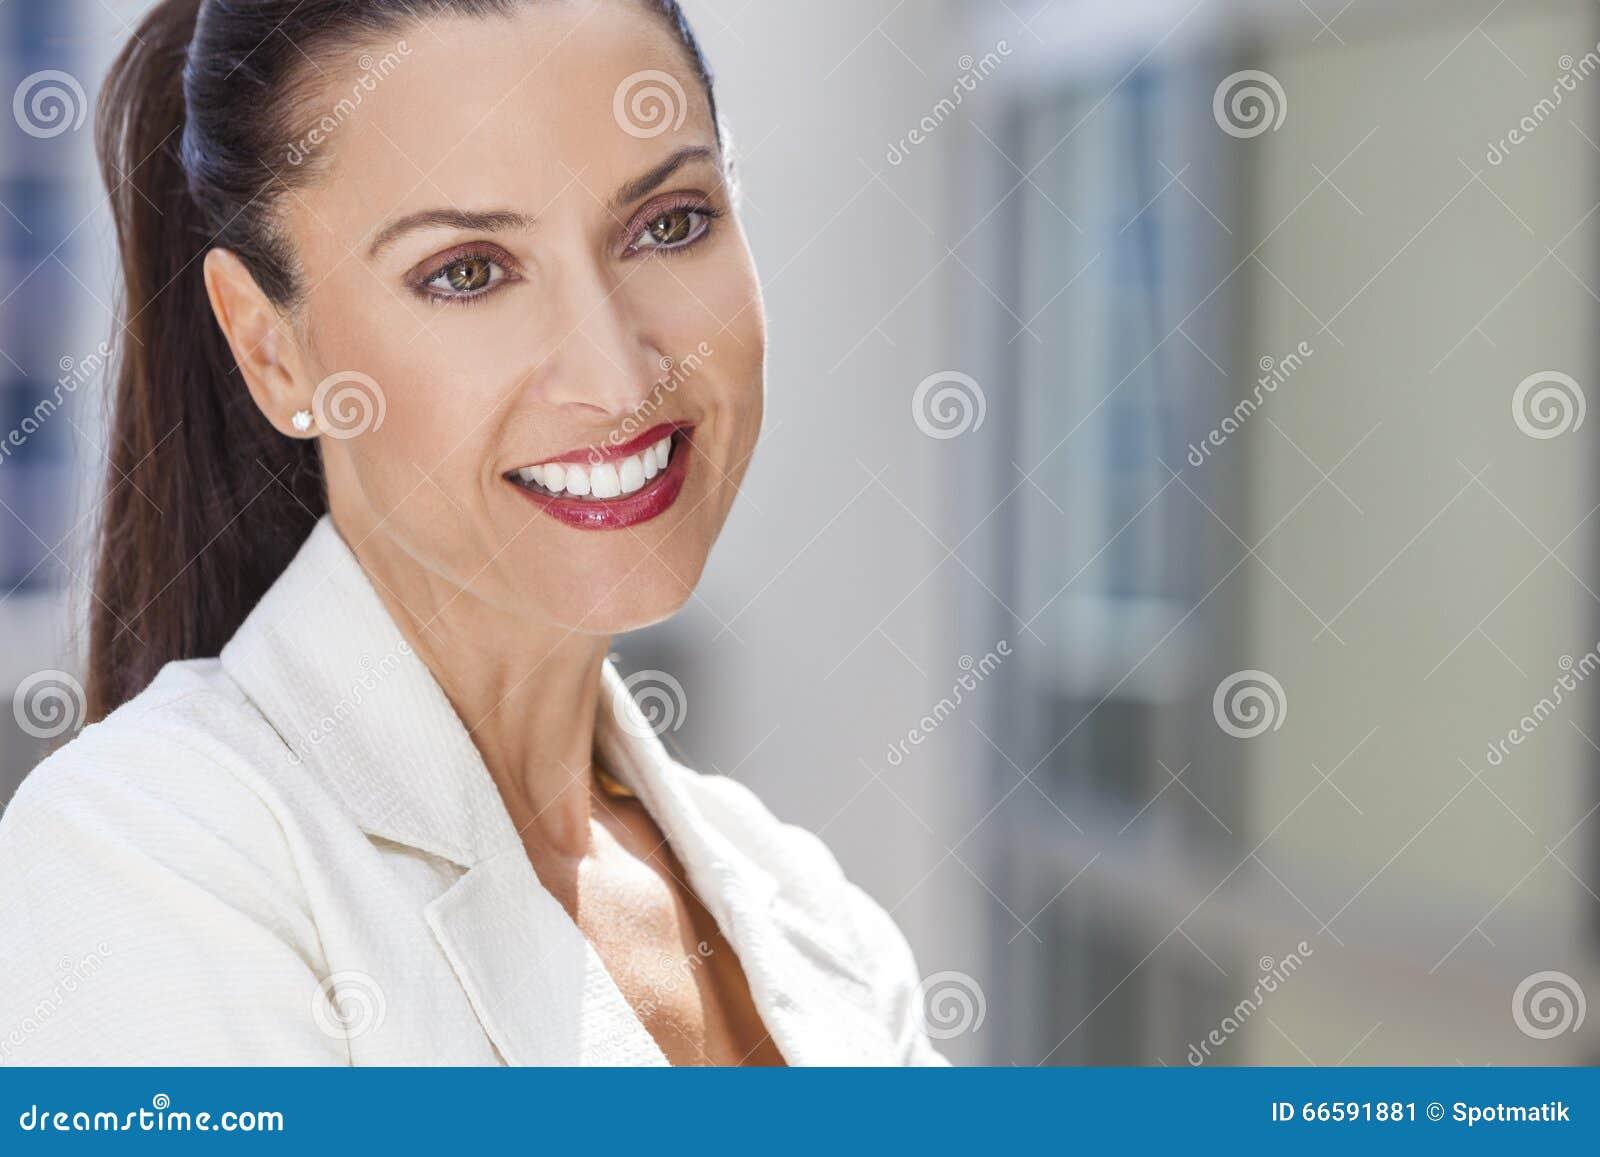 Portret van Mooie Vrouw of Onderneemster